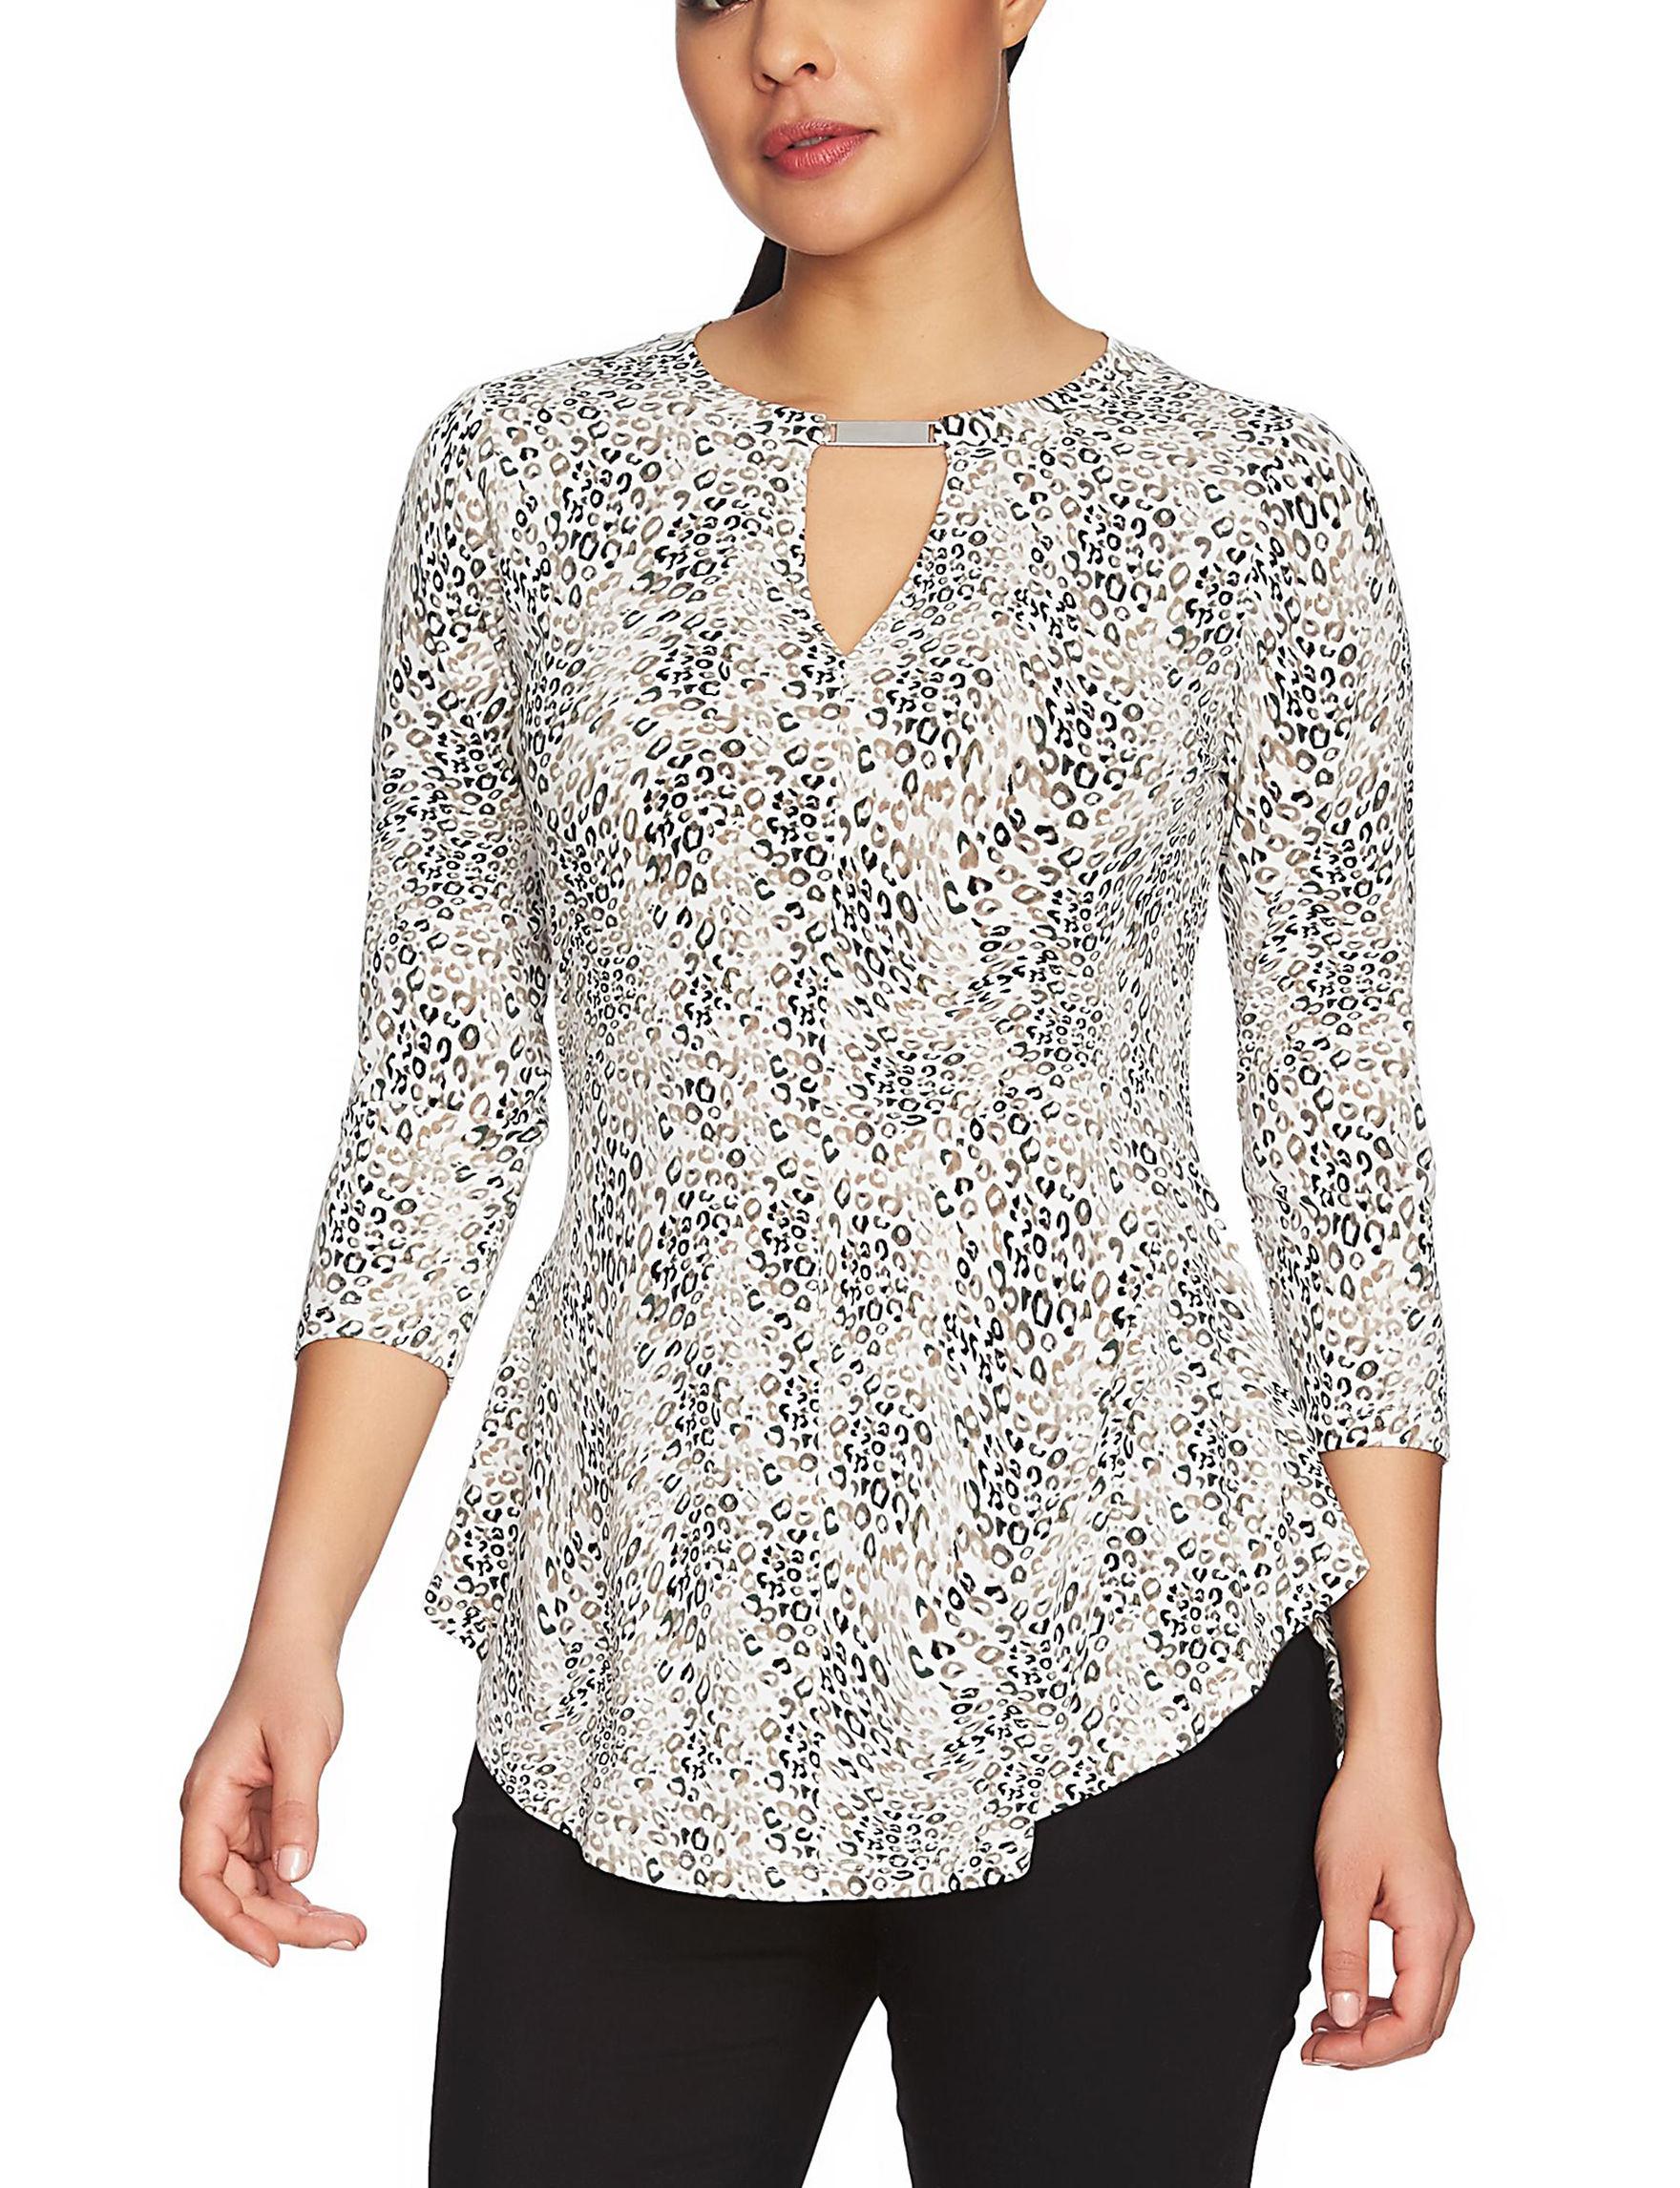 Chaus White / Multi Shirts & Blouses